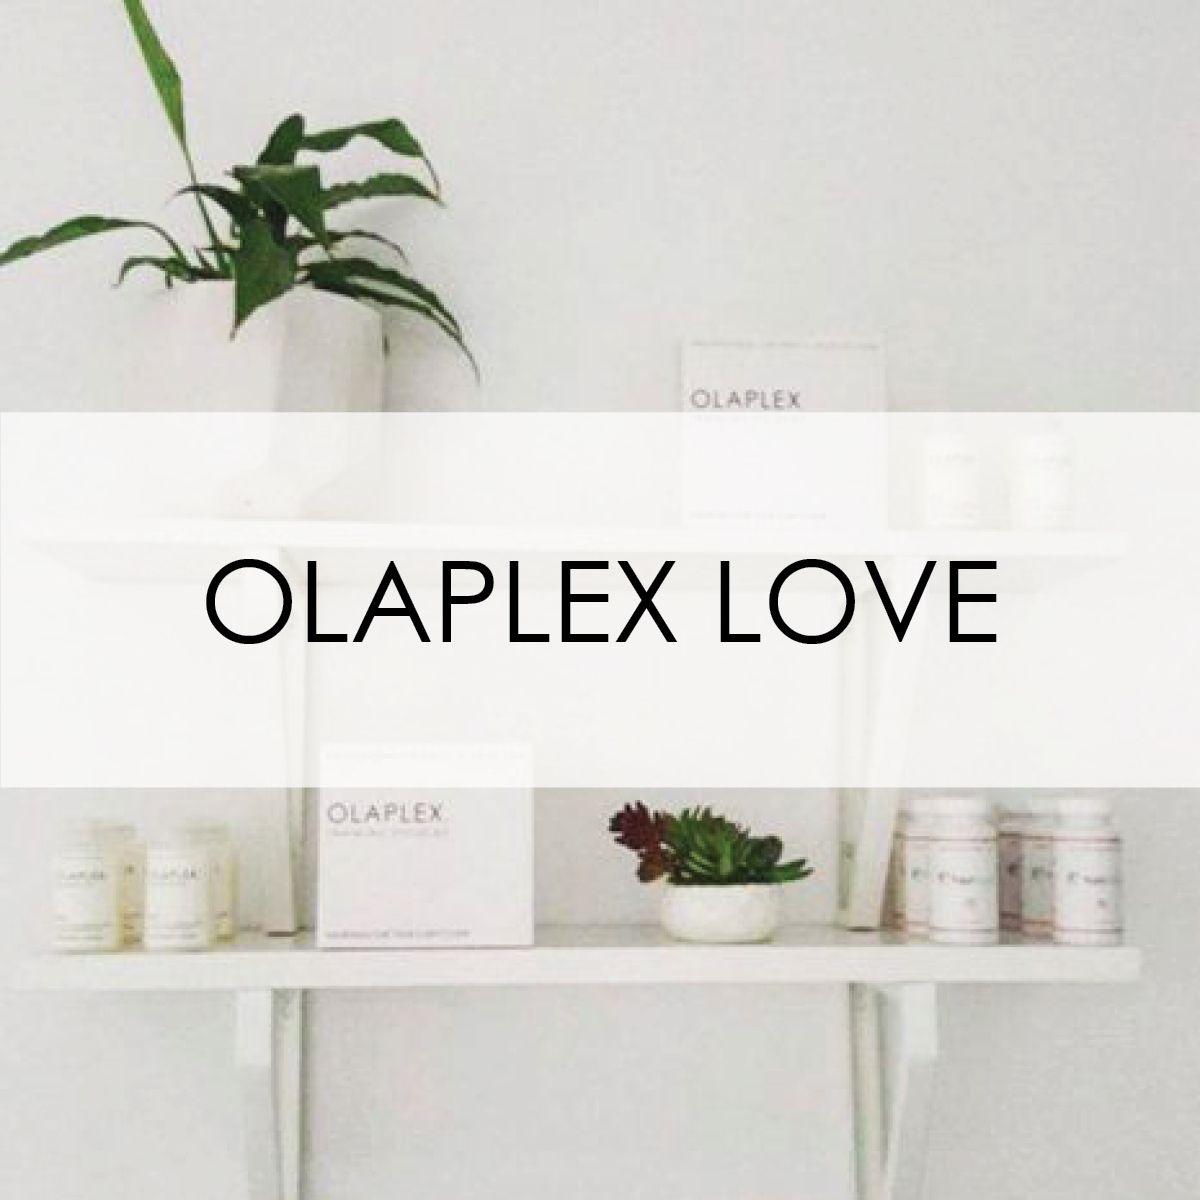 Pin van OLAPLEX op Olaplex Das Produkt Haar